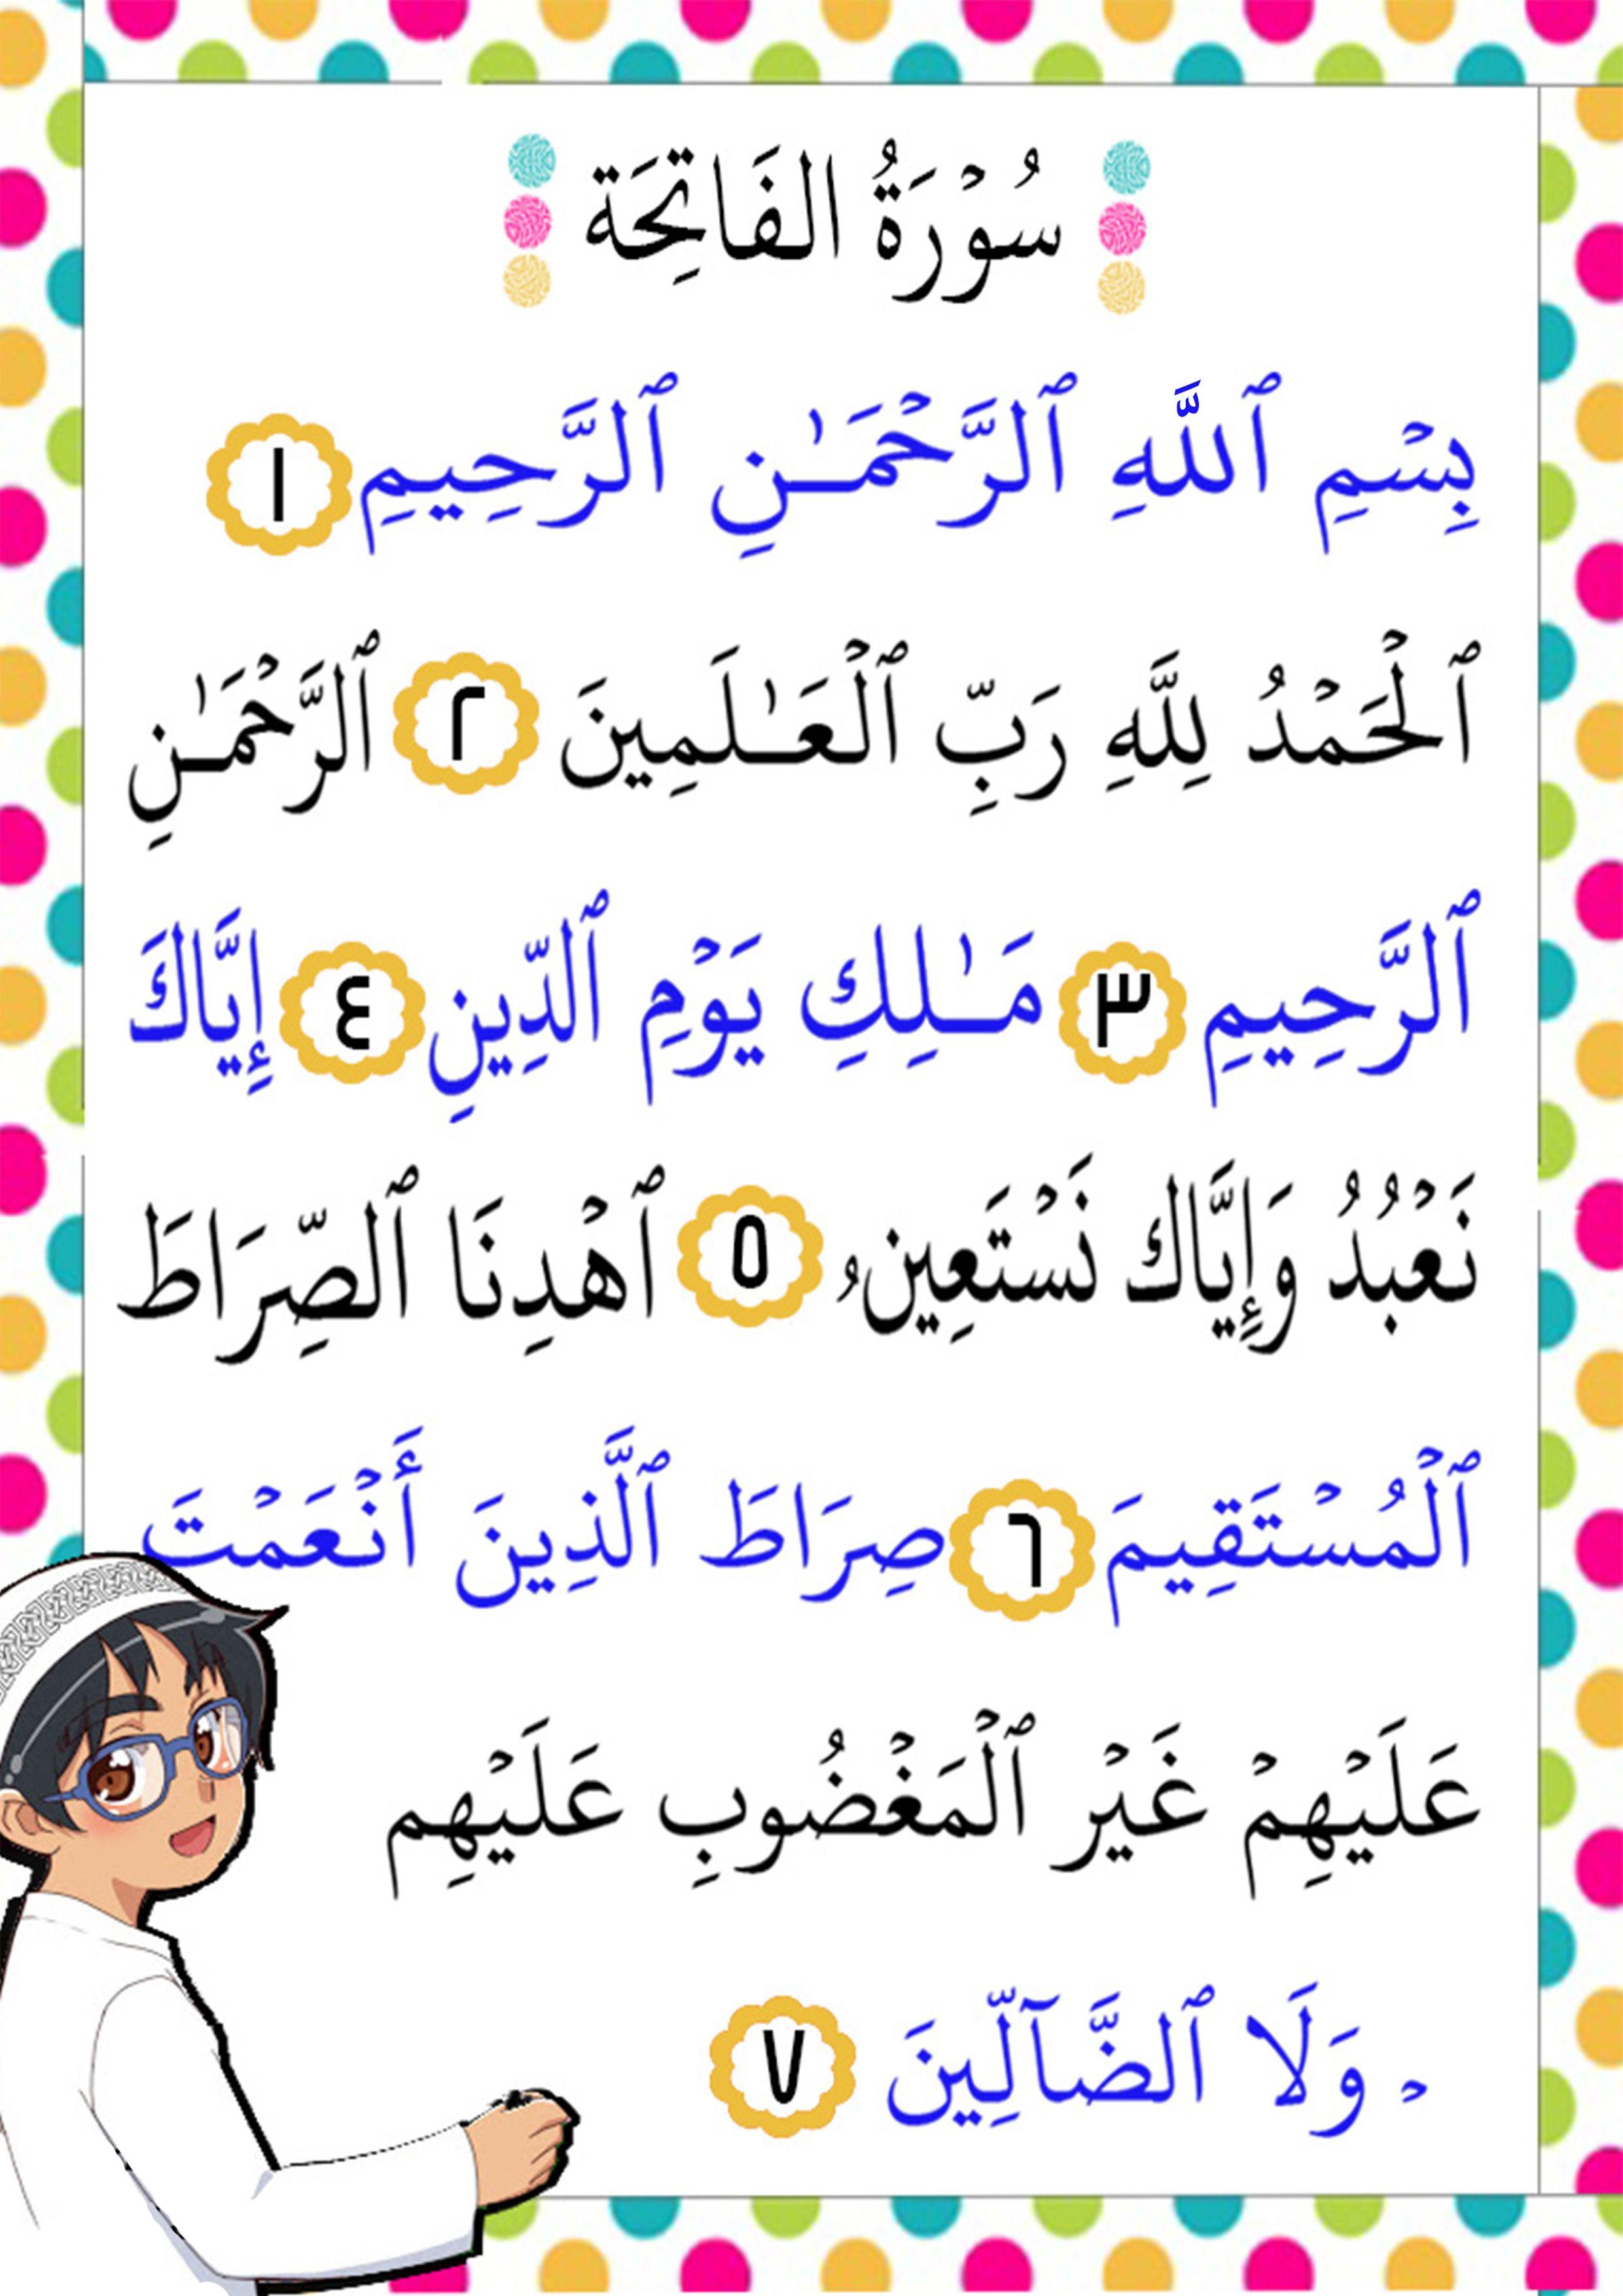 سورة الفاتحة Surat Al Fatiha Apprendre L Arabe Coran Enfant Fiches De Travail Pour Maternelles